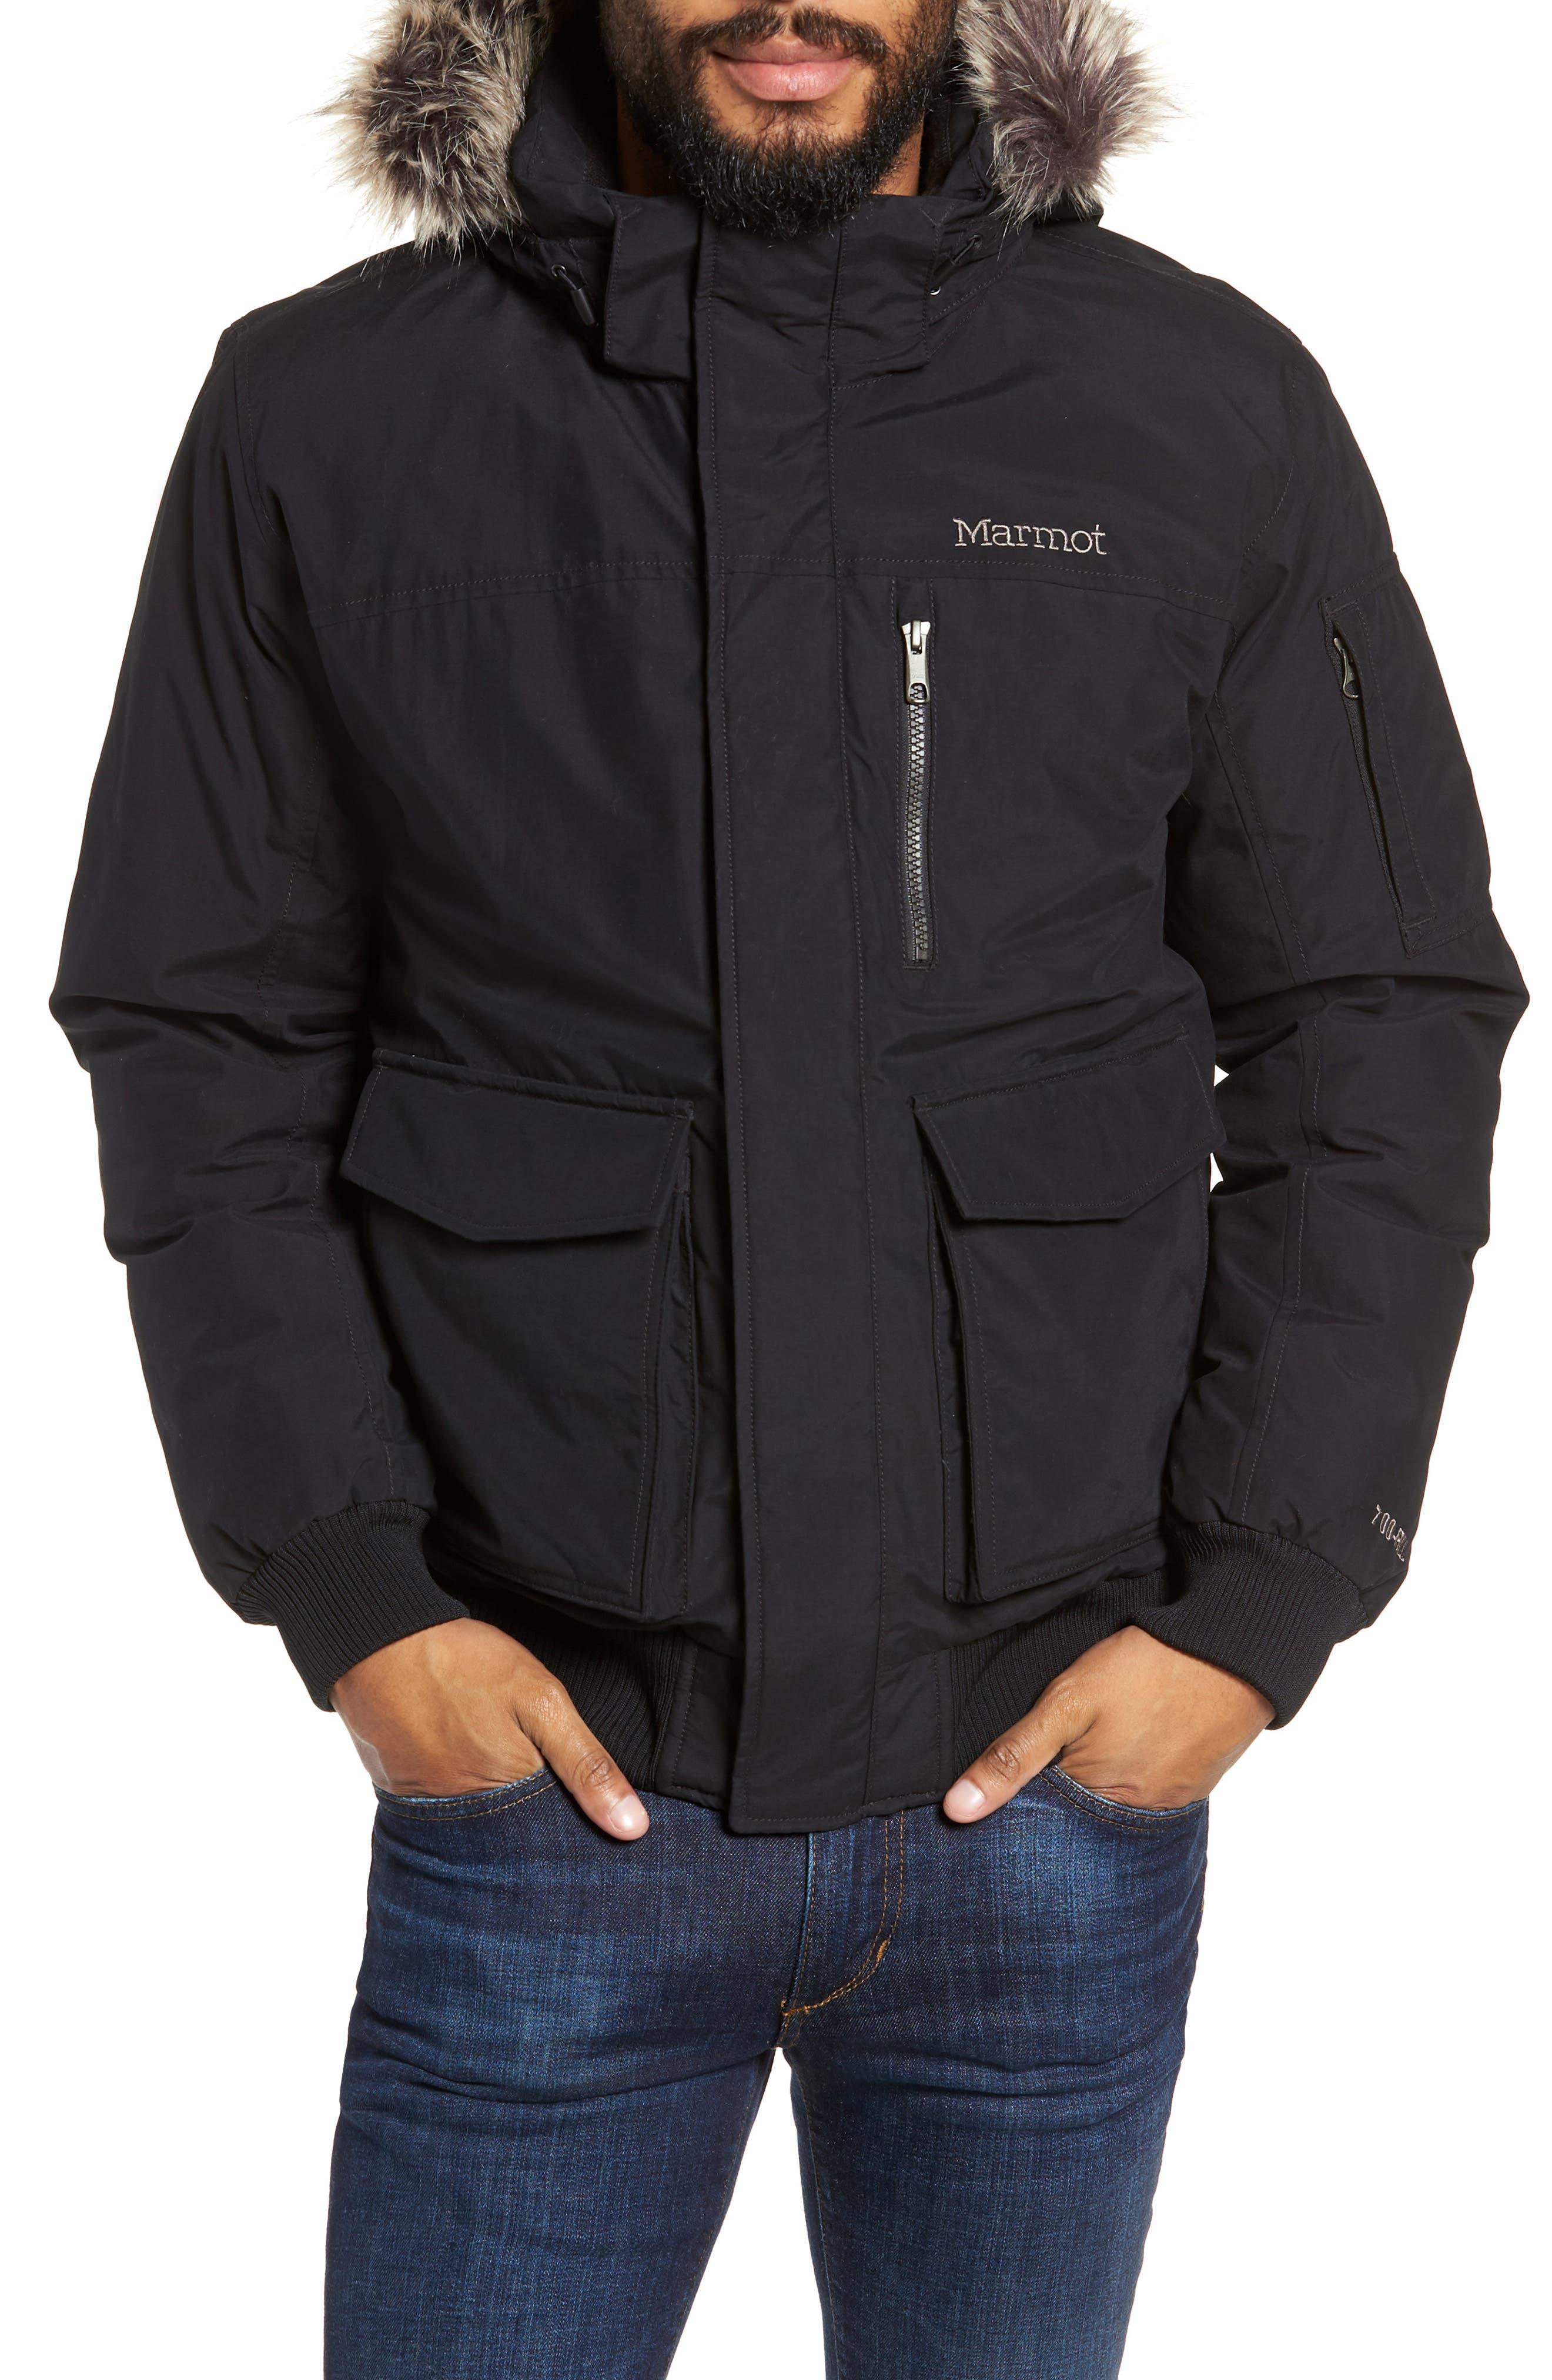 Marmot Stonehaven Waterproof 700 Fill Power Down Jacket With Faux Fur Trim, Black